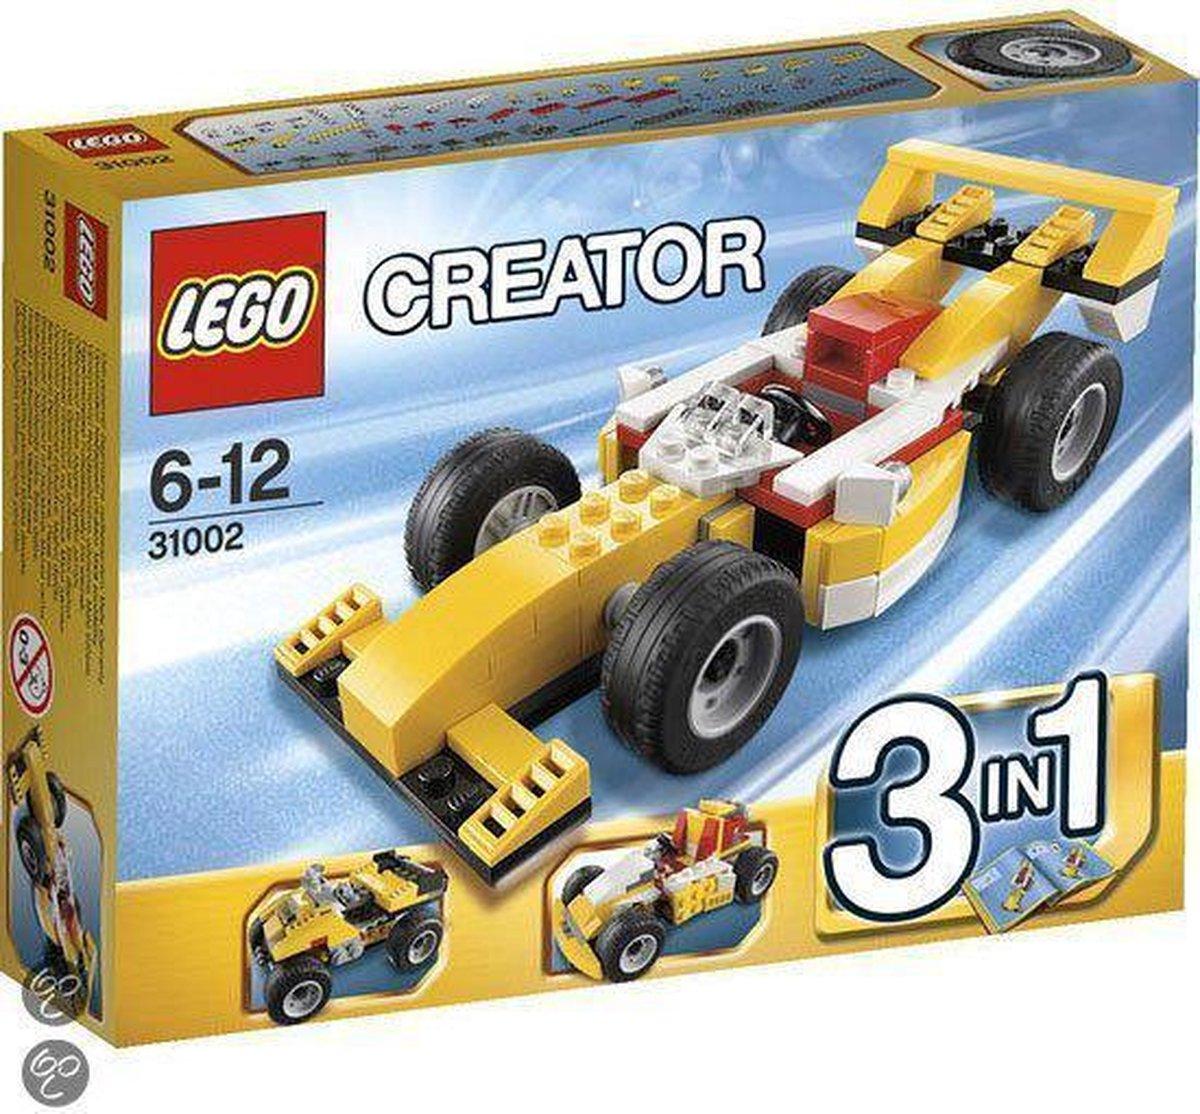 Lego Creator 31002 Super Racer